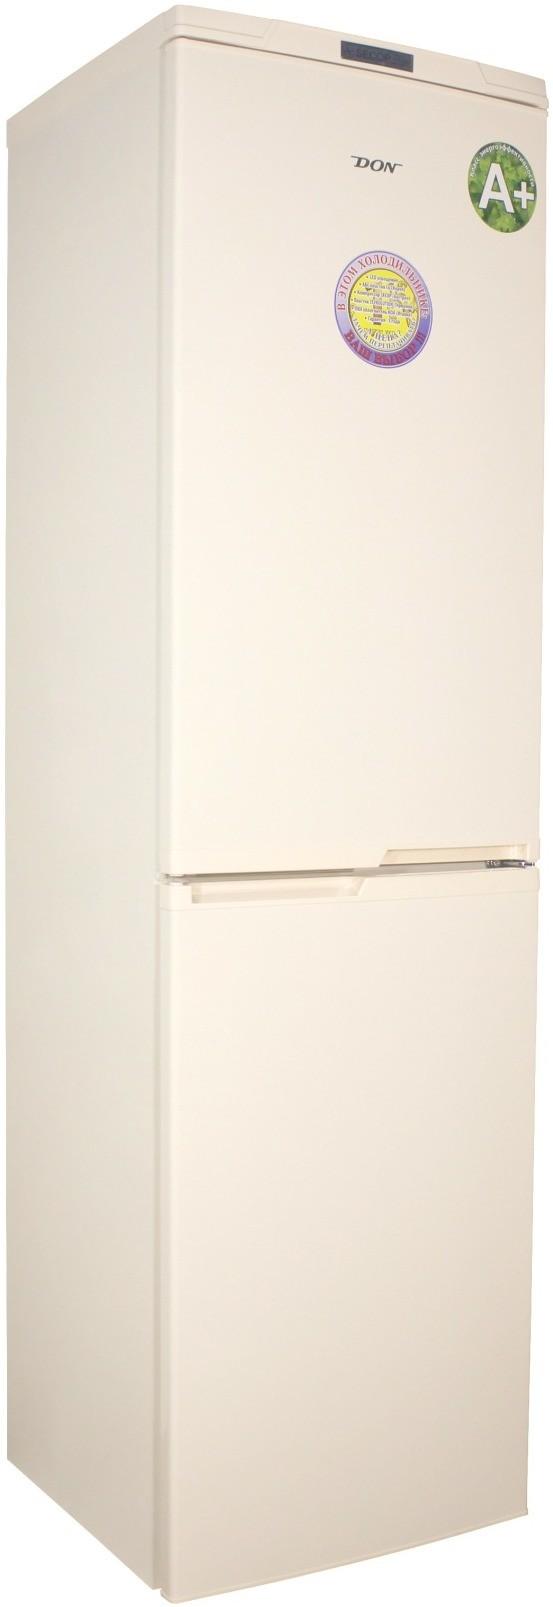 Холодильник Don R-297 S